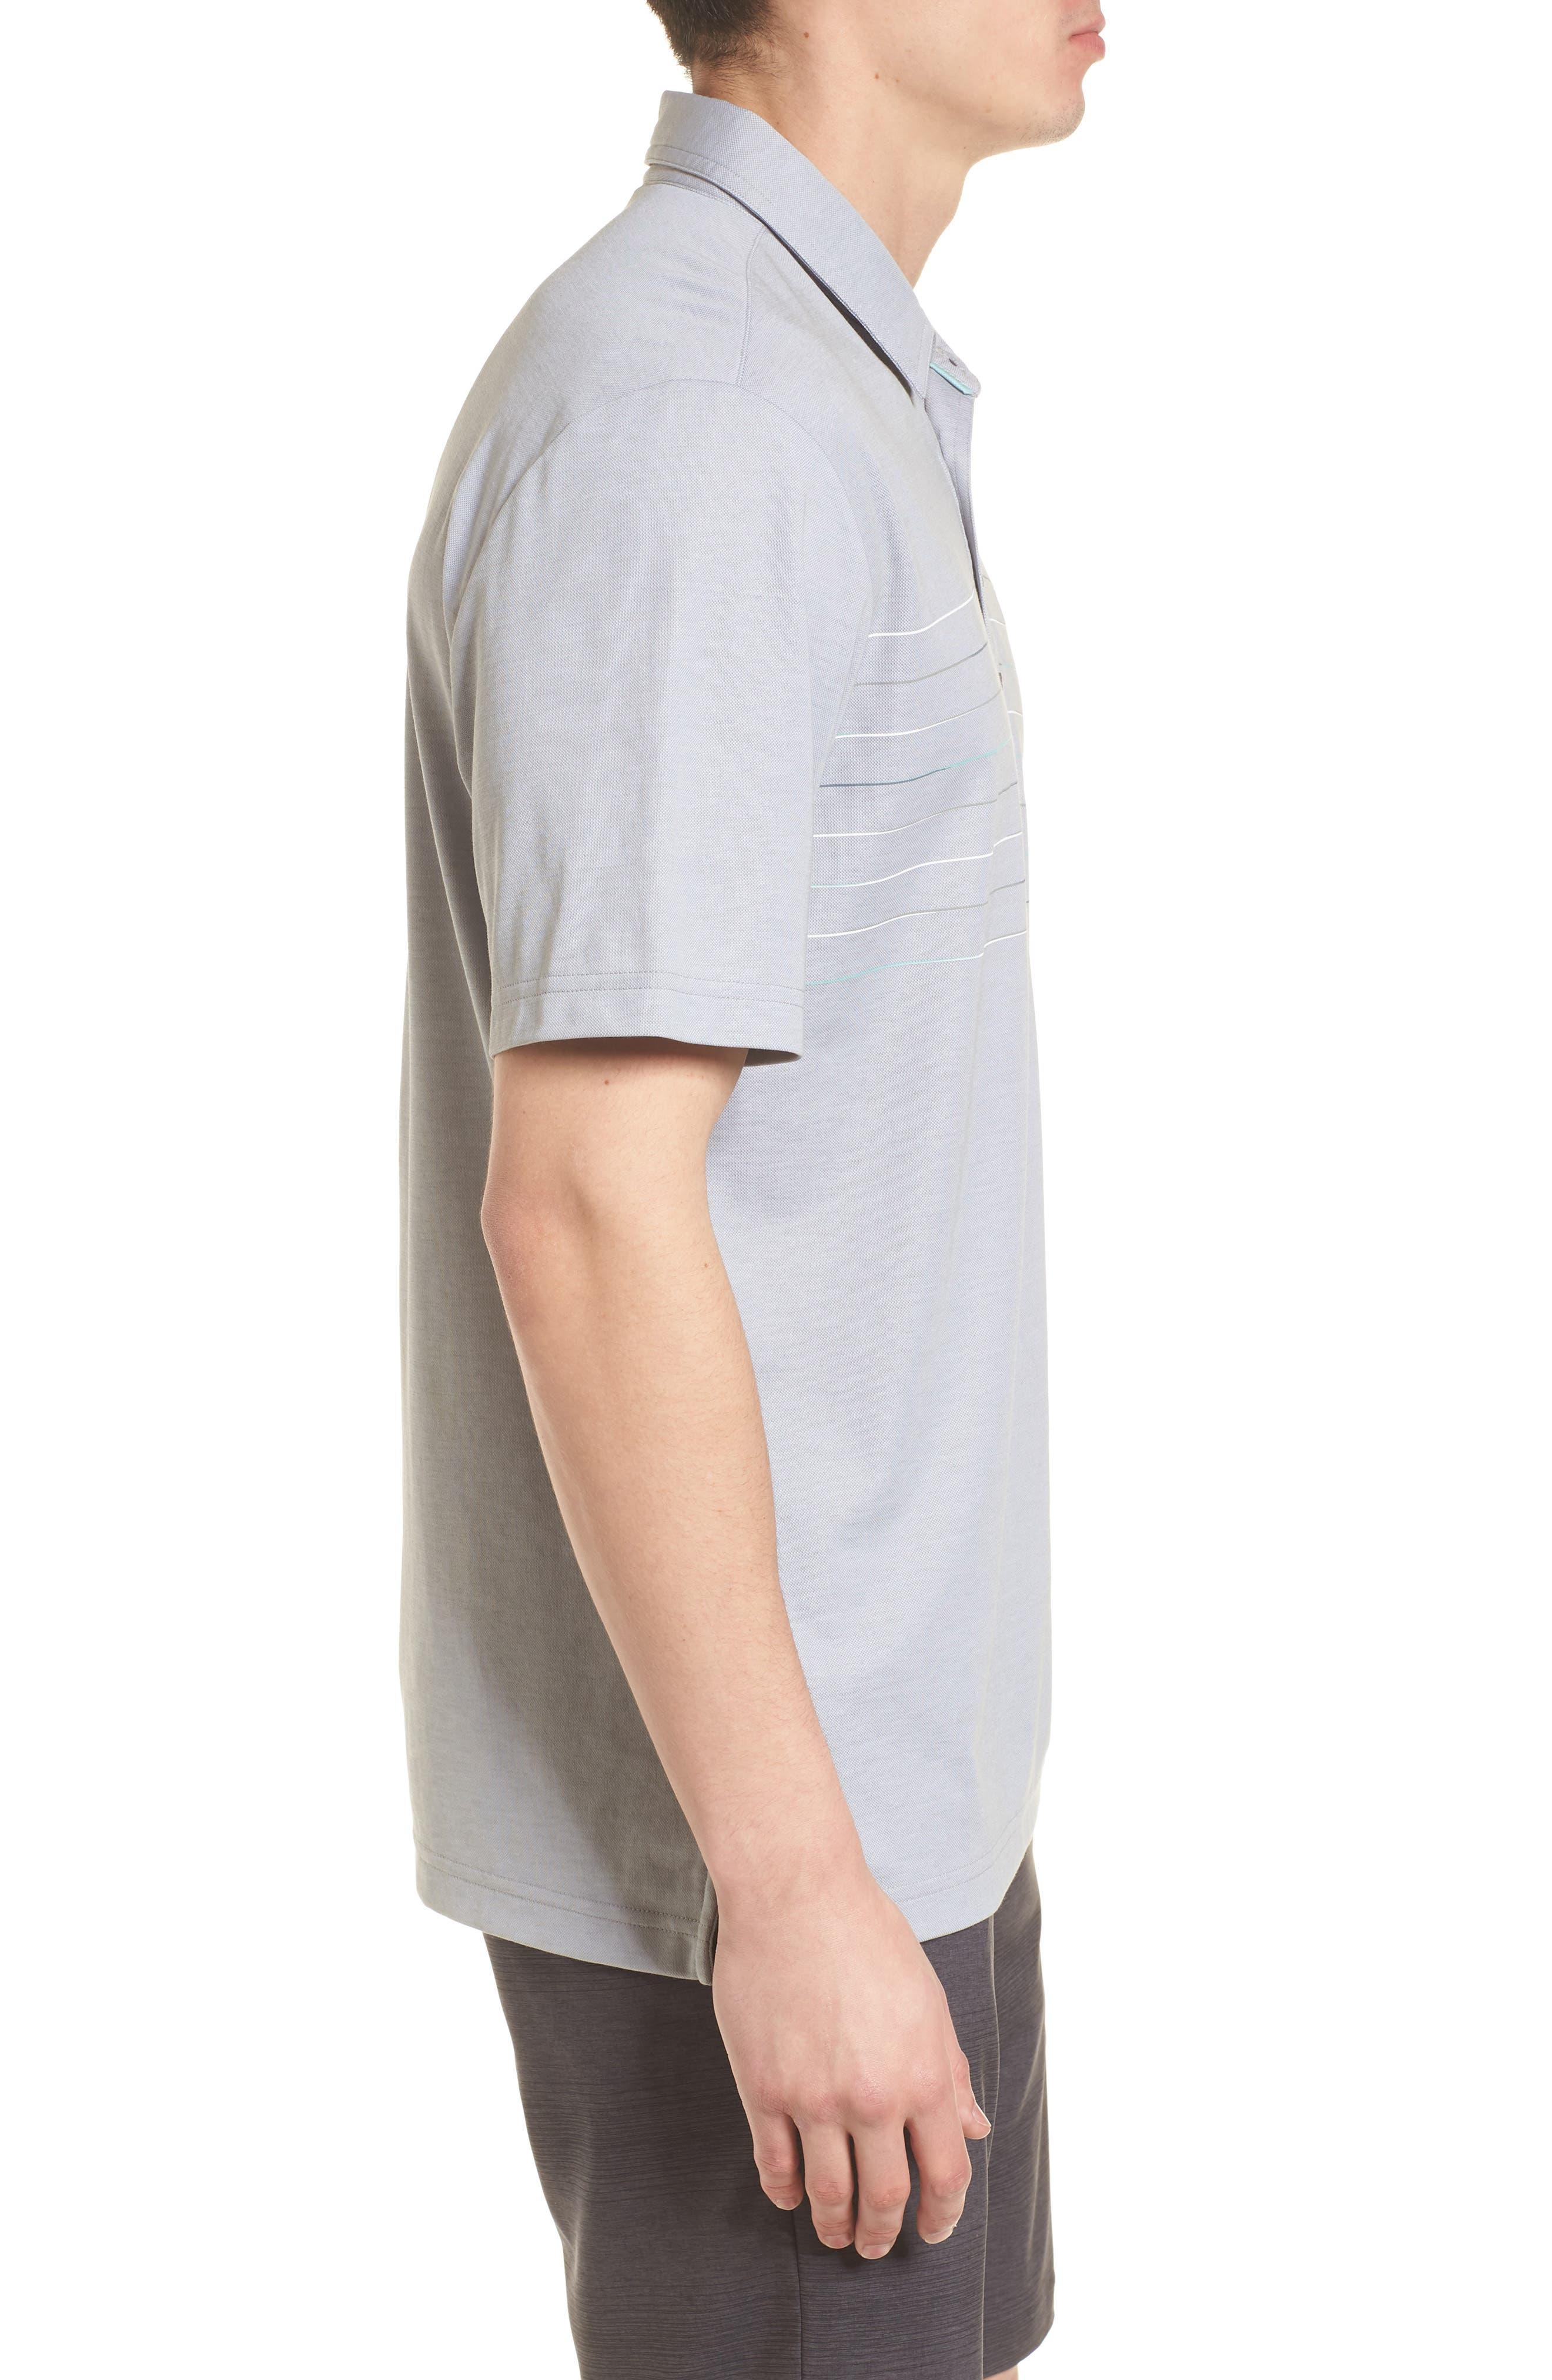 Good Good Polo Shirt,                             Alternate thumbnail 3, color,                             Heather Grey Monument